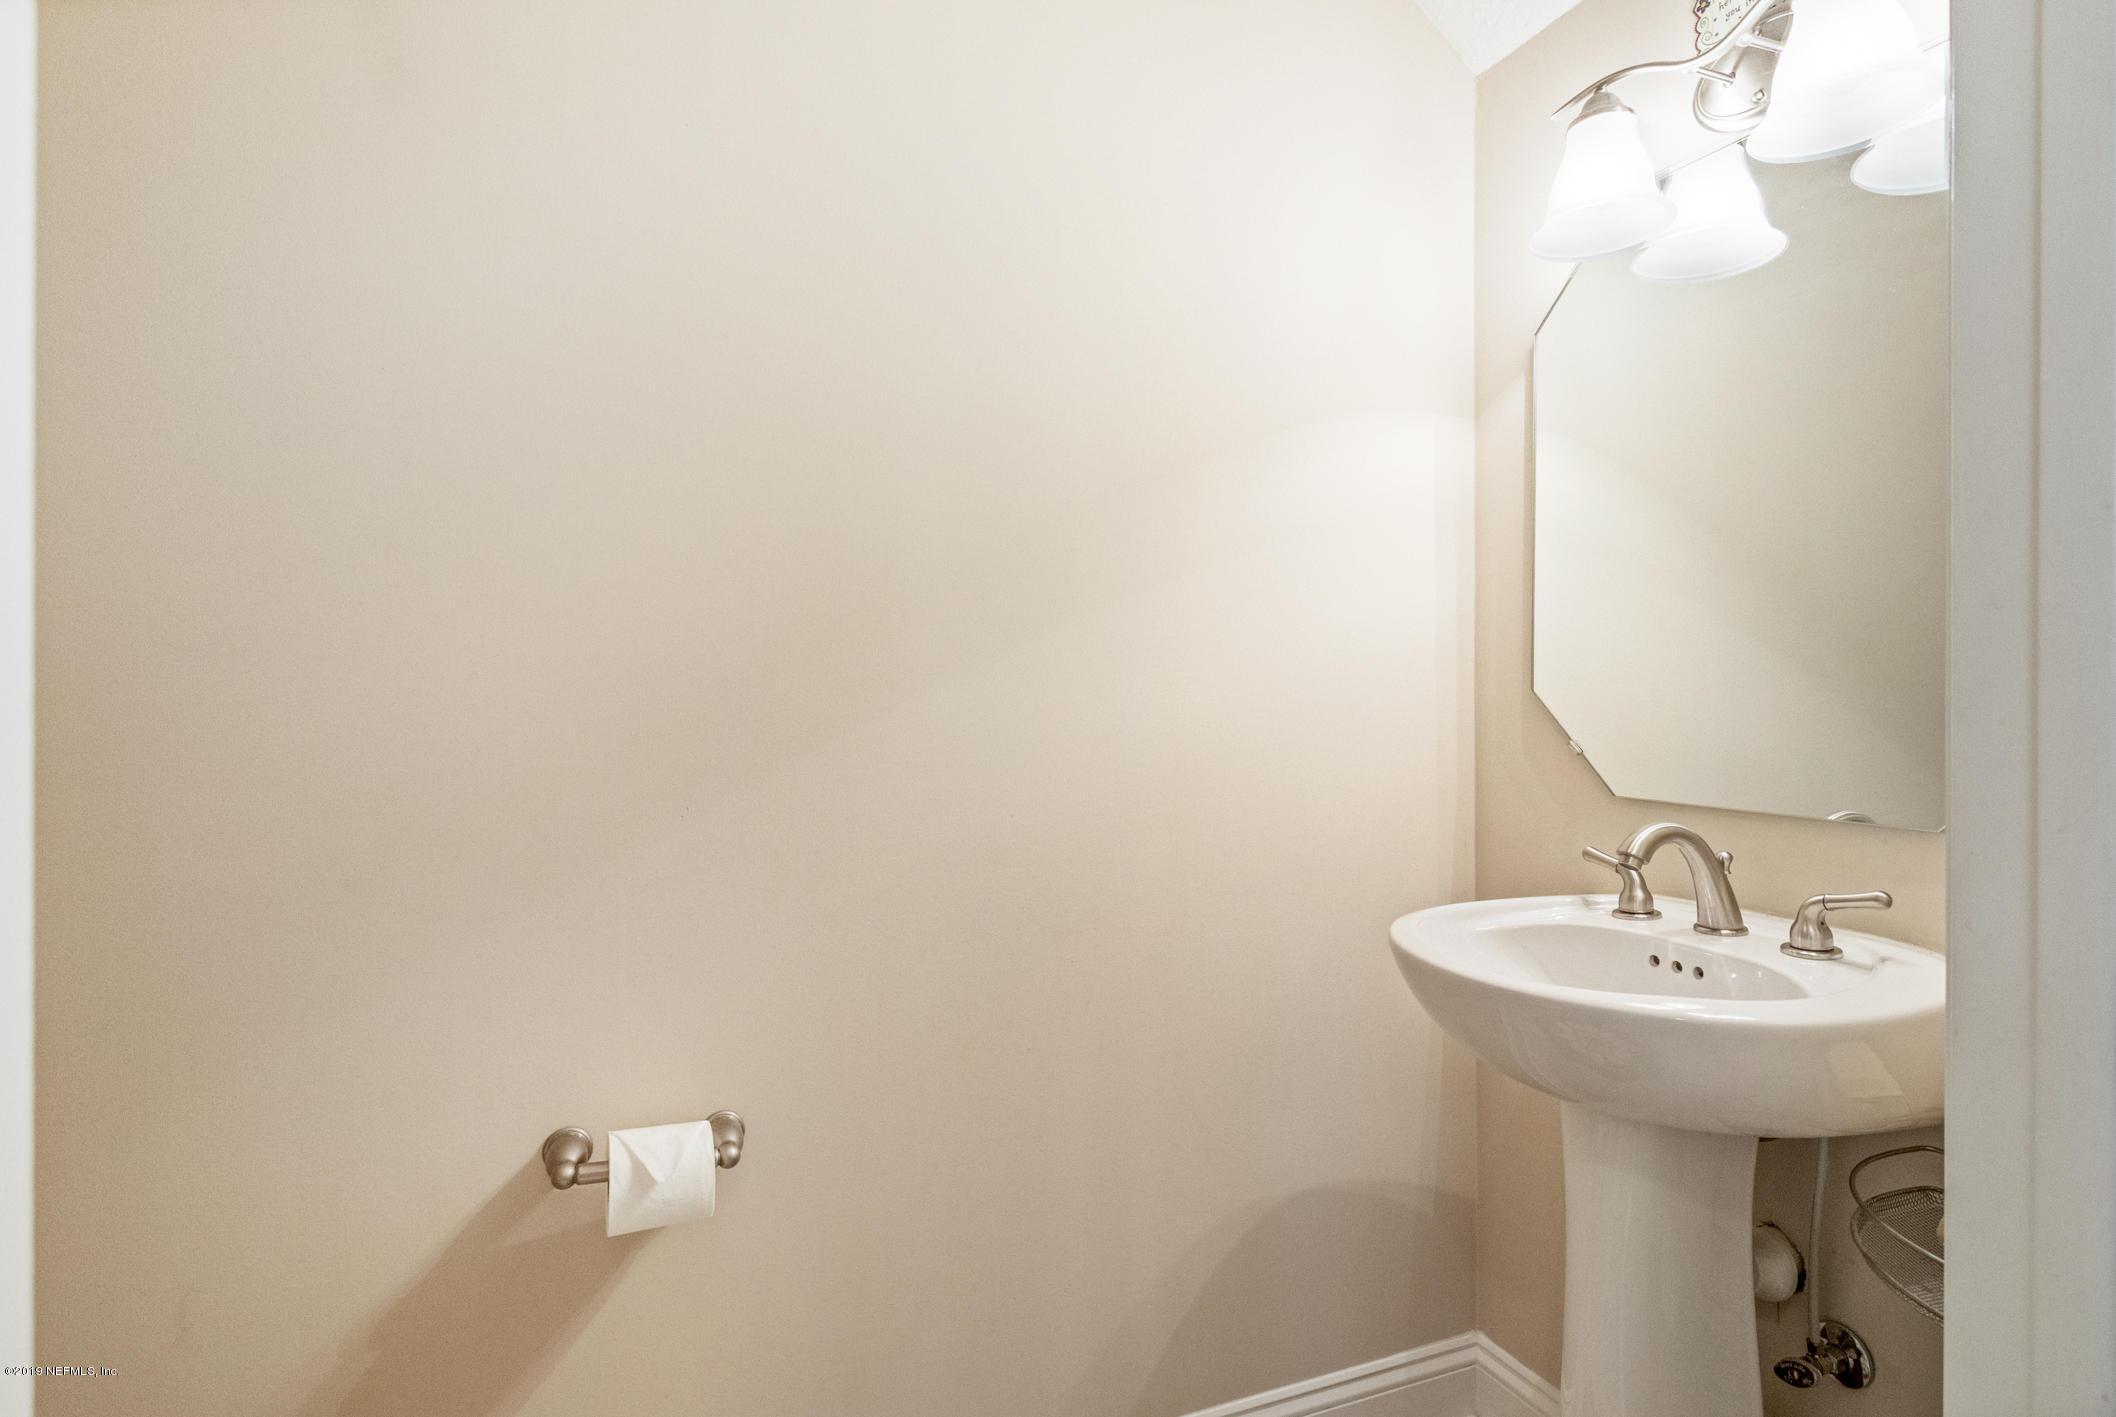 48 GRAND RAVINE, ST AUGUSTINE, FLORIDA 32086, 3 Bedrooms Bedrooms, ,3 BathroomsBathrooms,Condo,For sale,GRAND RAVINE,1005433